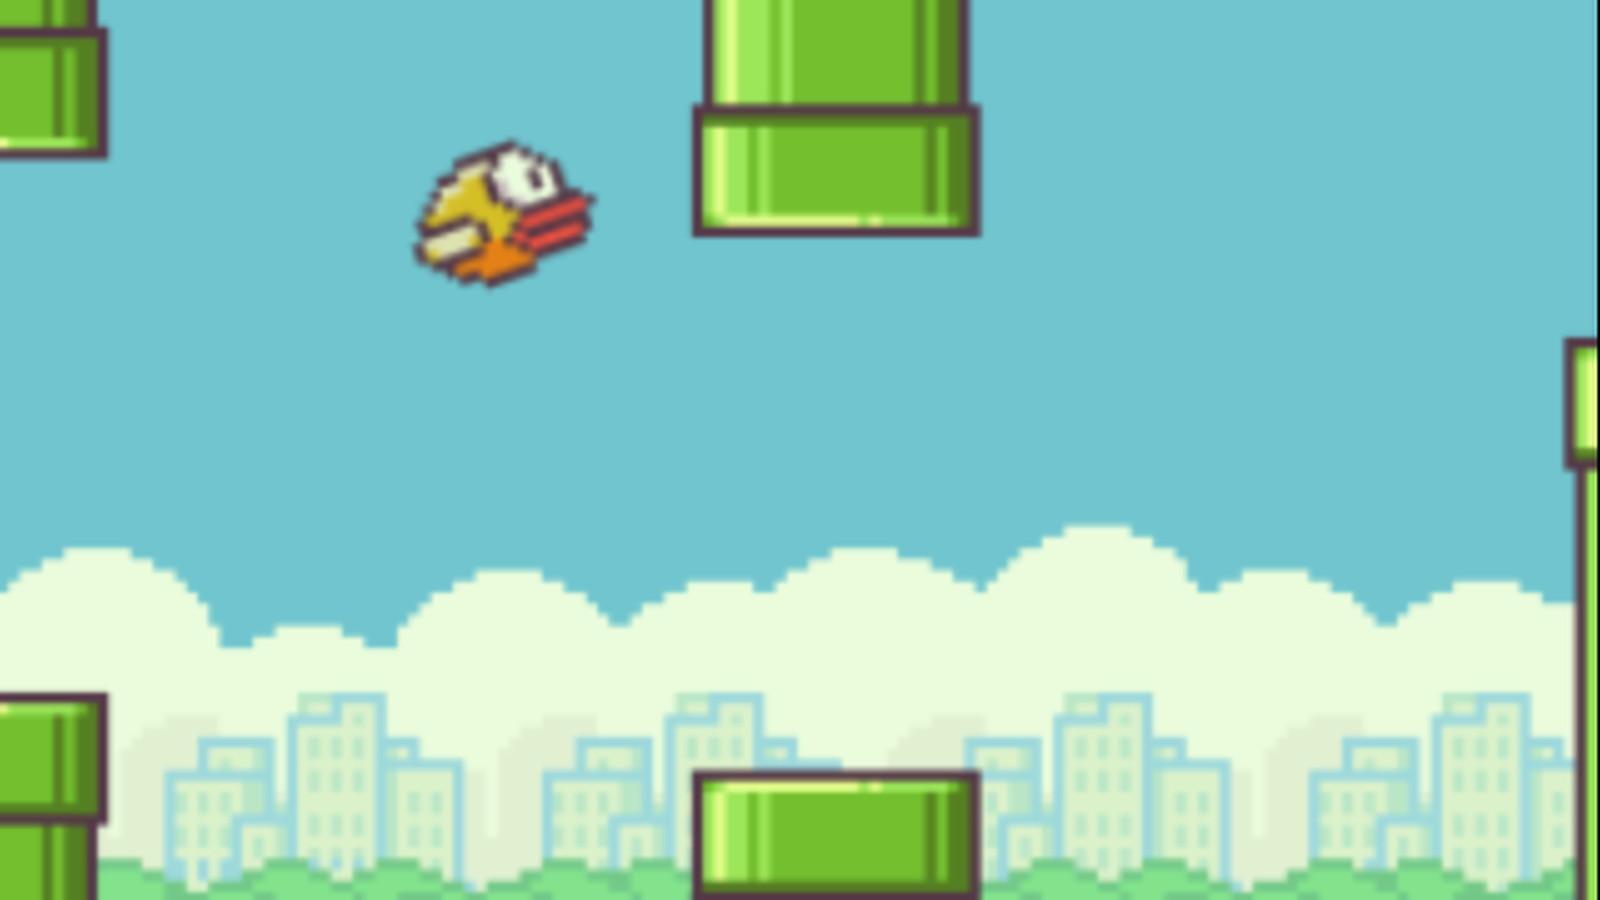 Indie smash hit 'Flappy Bird' racks up $50K per day in ad ...